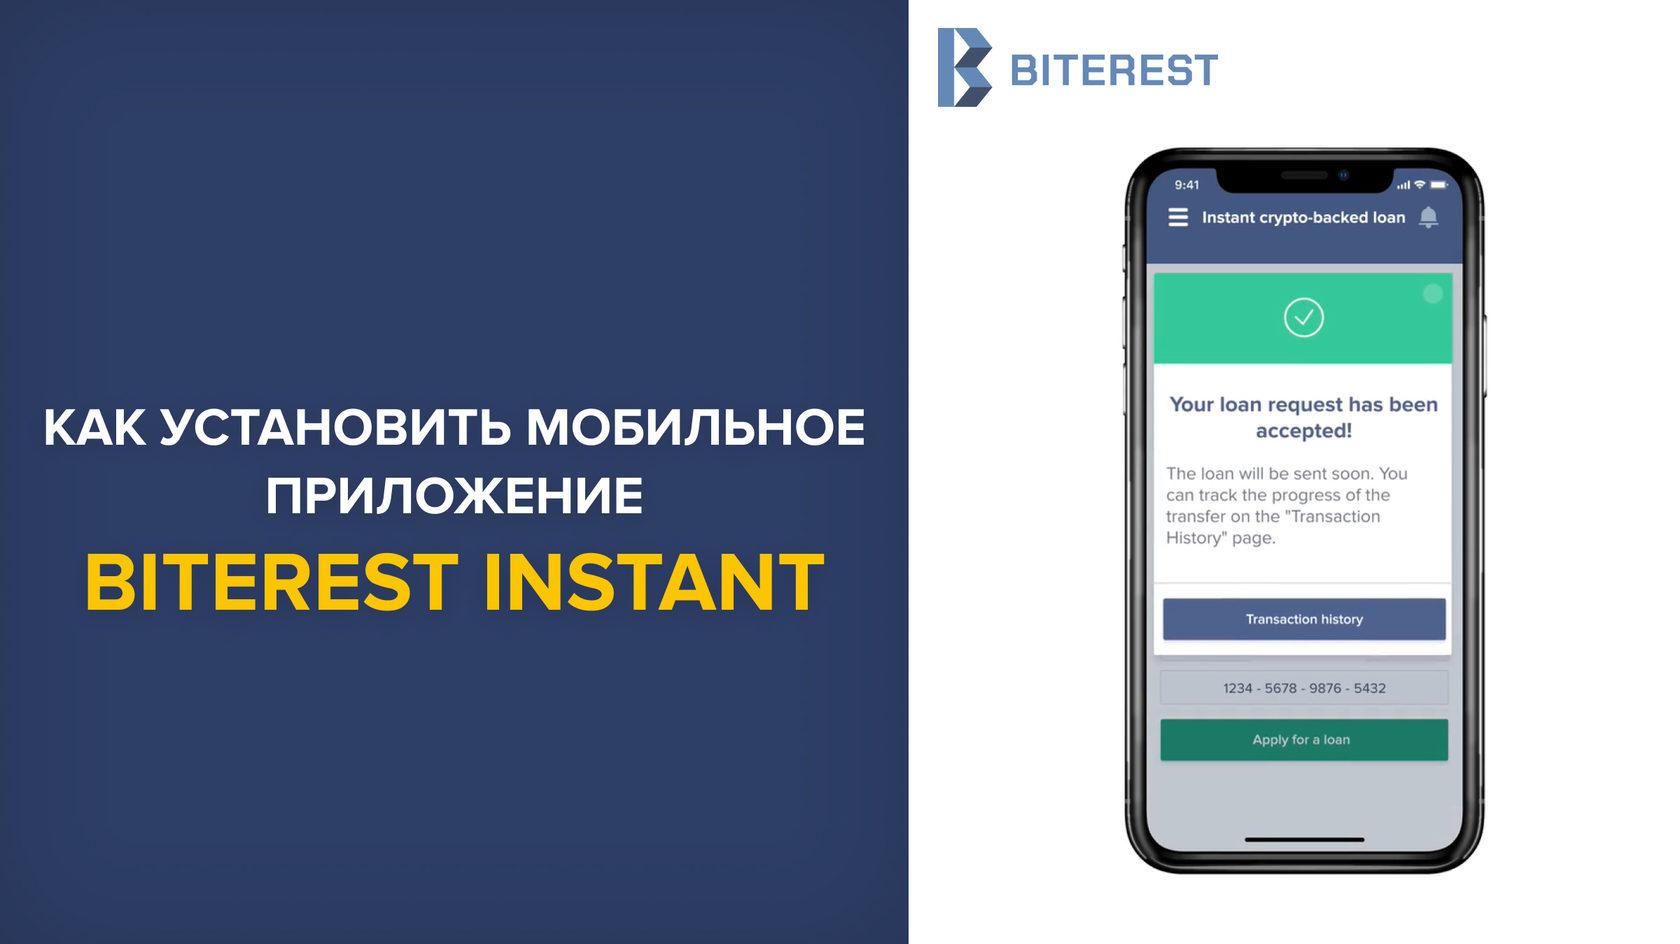 Приложение Biterest стало доступно для Android, iOS и Windows